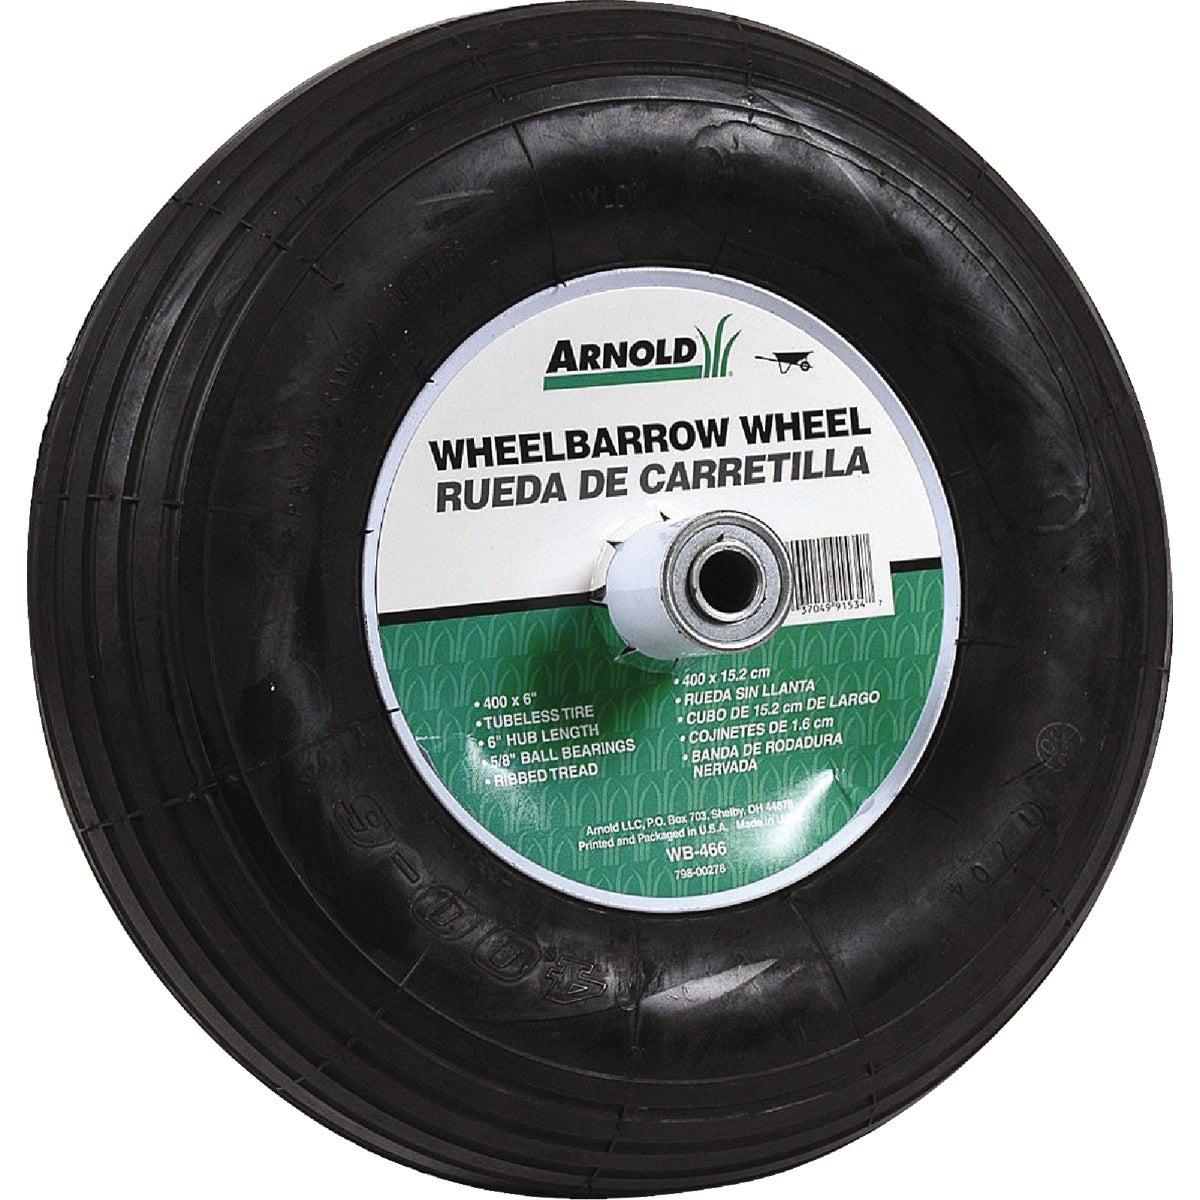 Arnold 6 In. Hub Pneumatic Wheelbarrow Wheel, WB-466